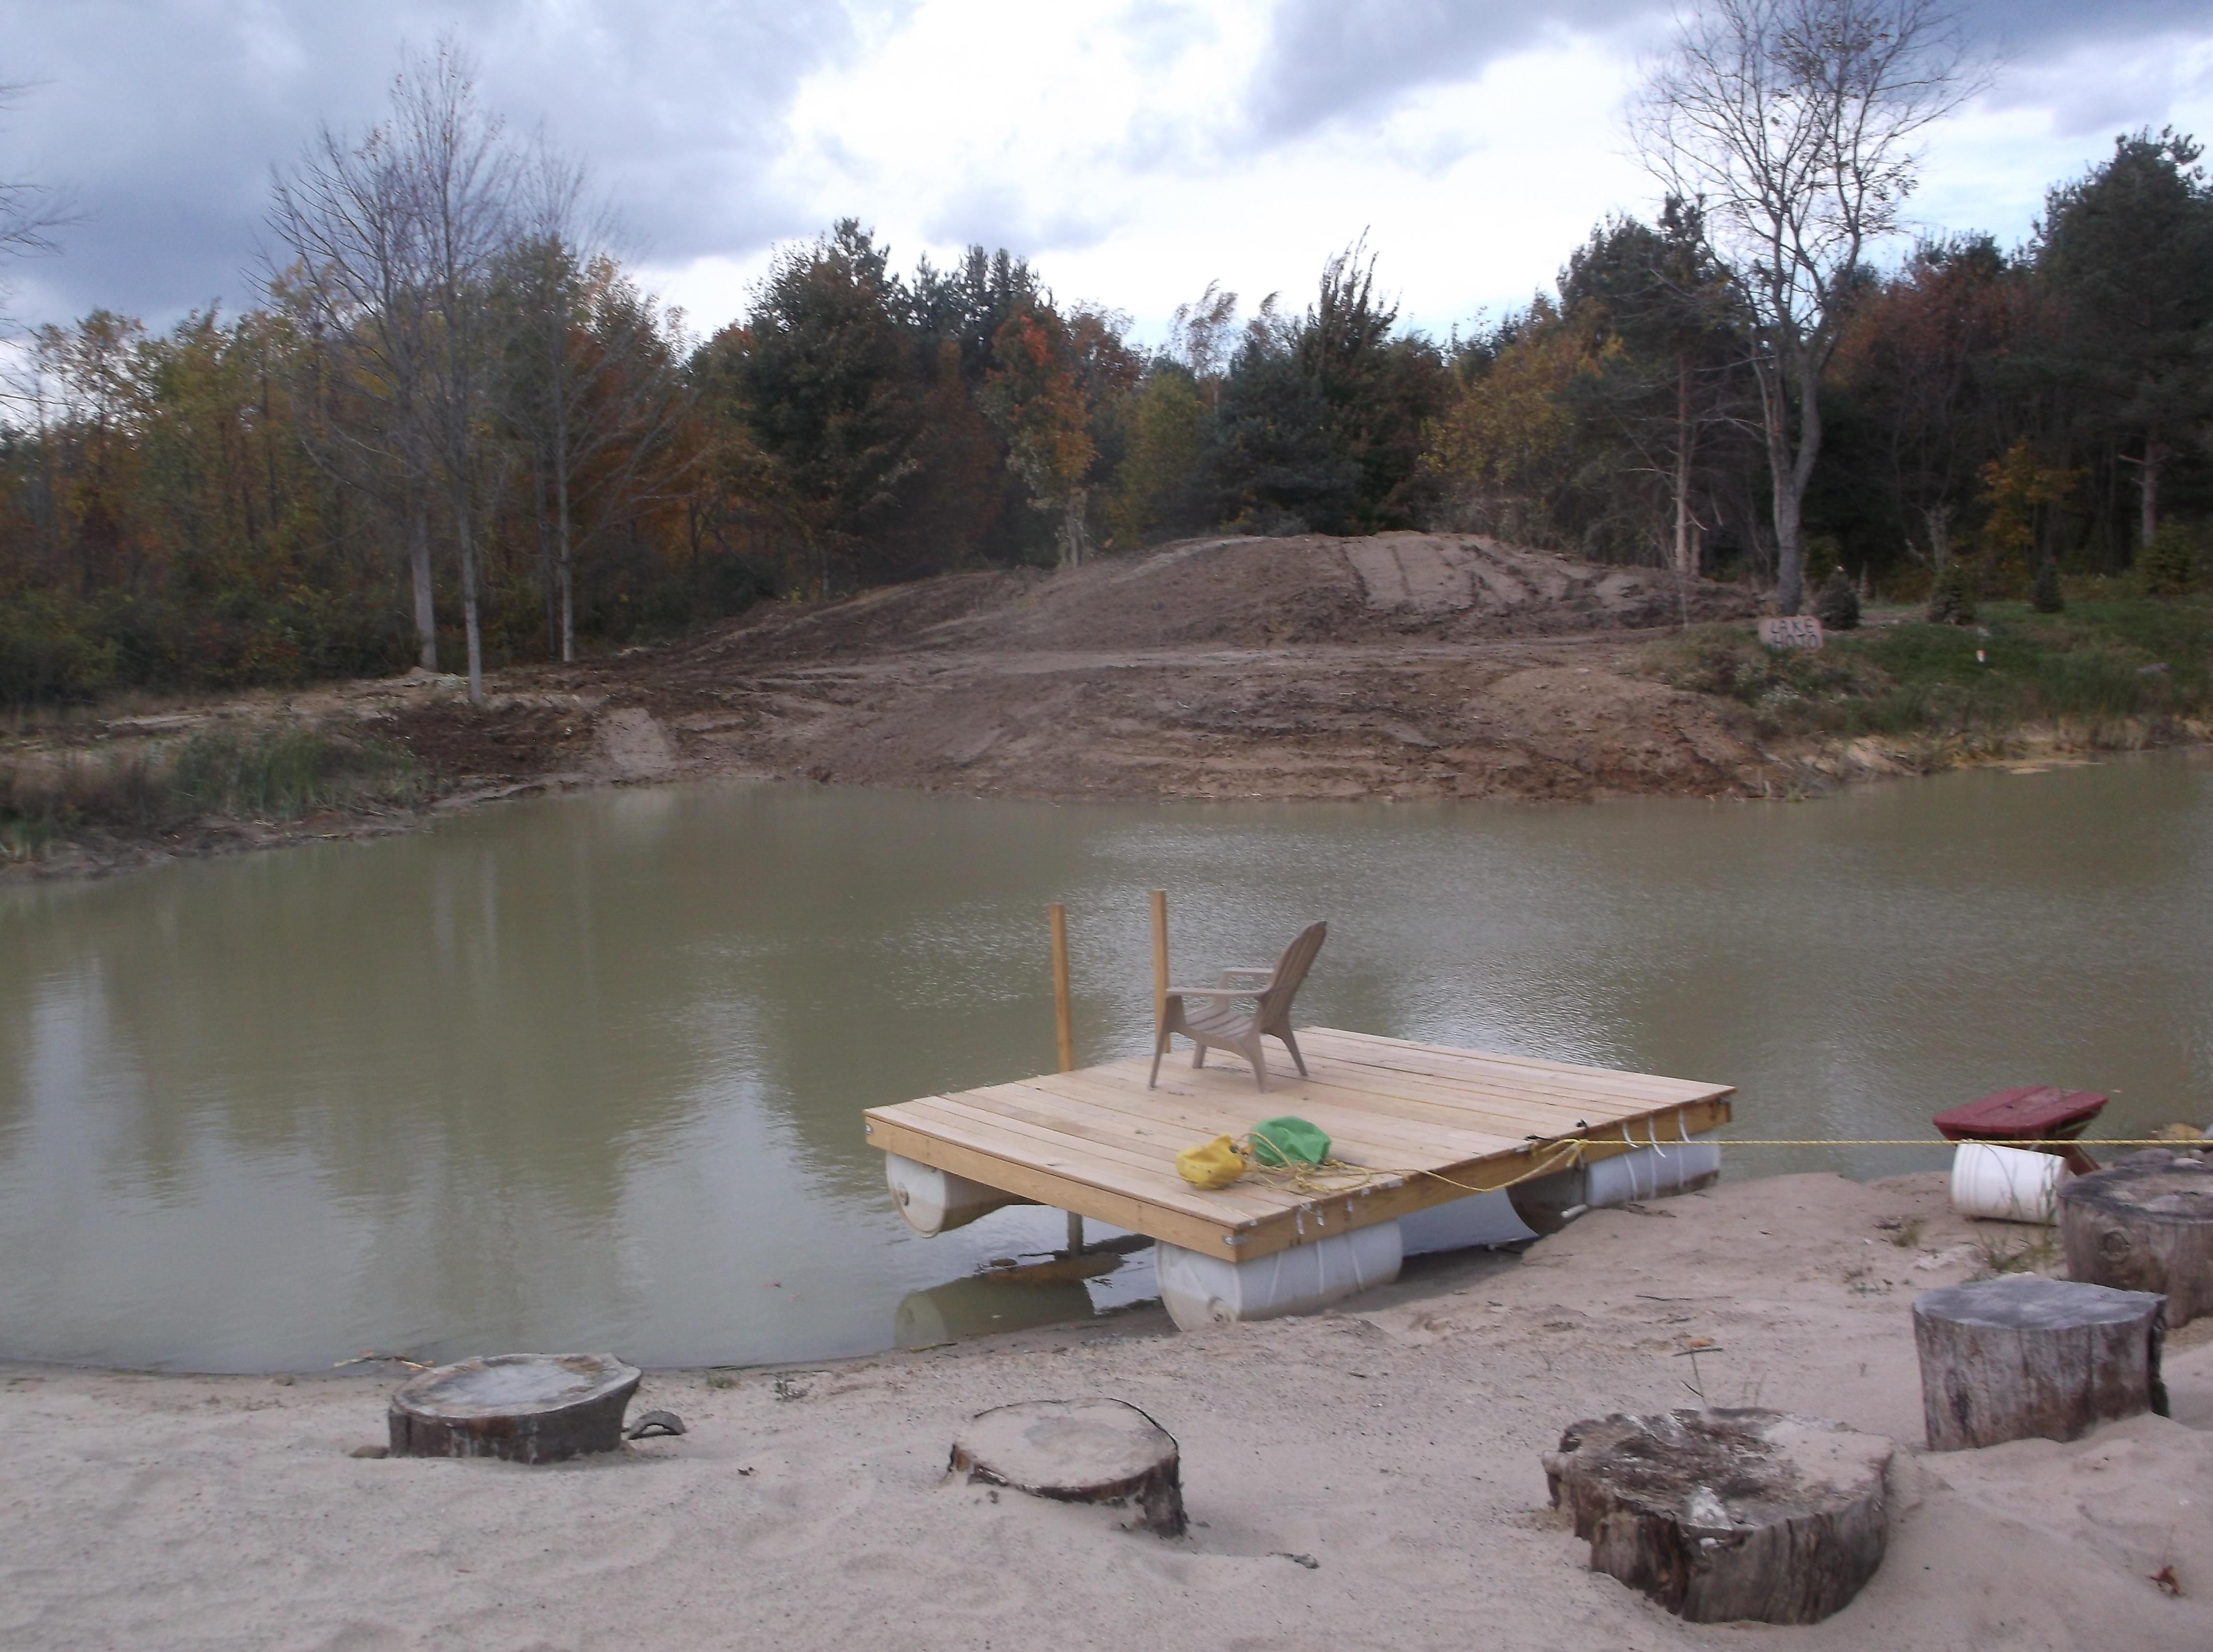 Emmett, Michigan long reach excavator   (62) (N).jpg